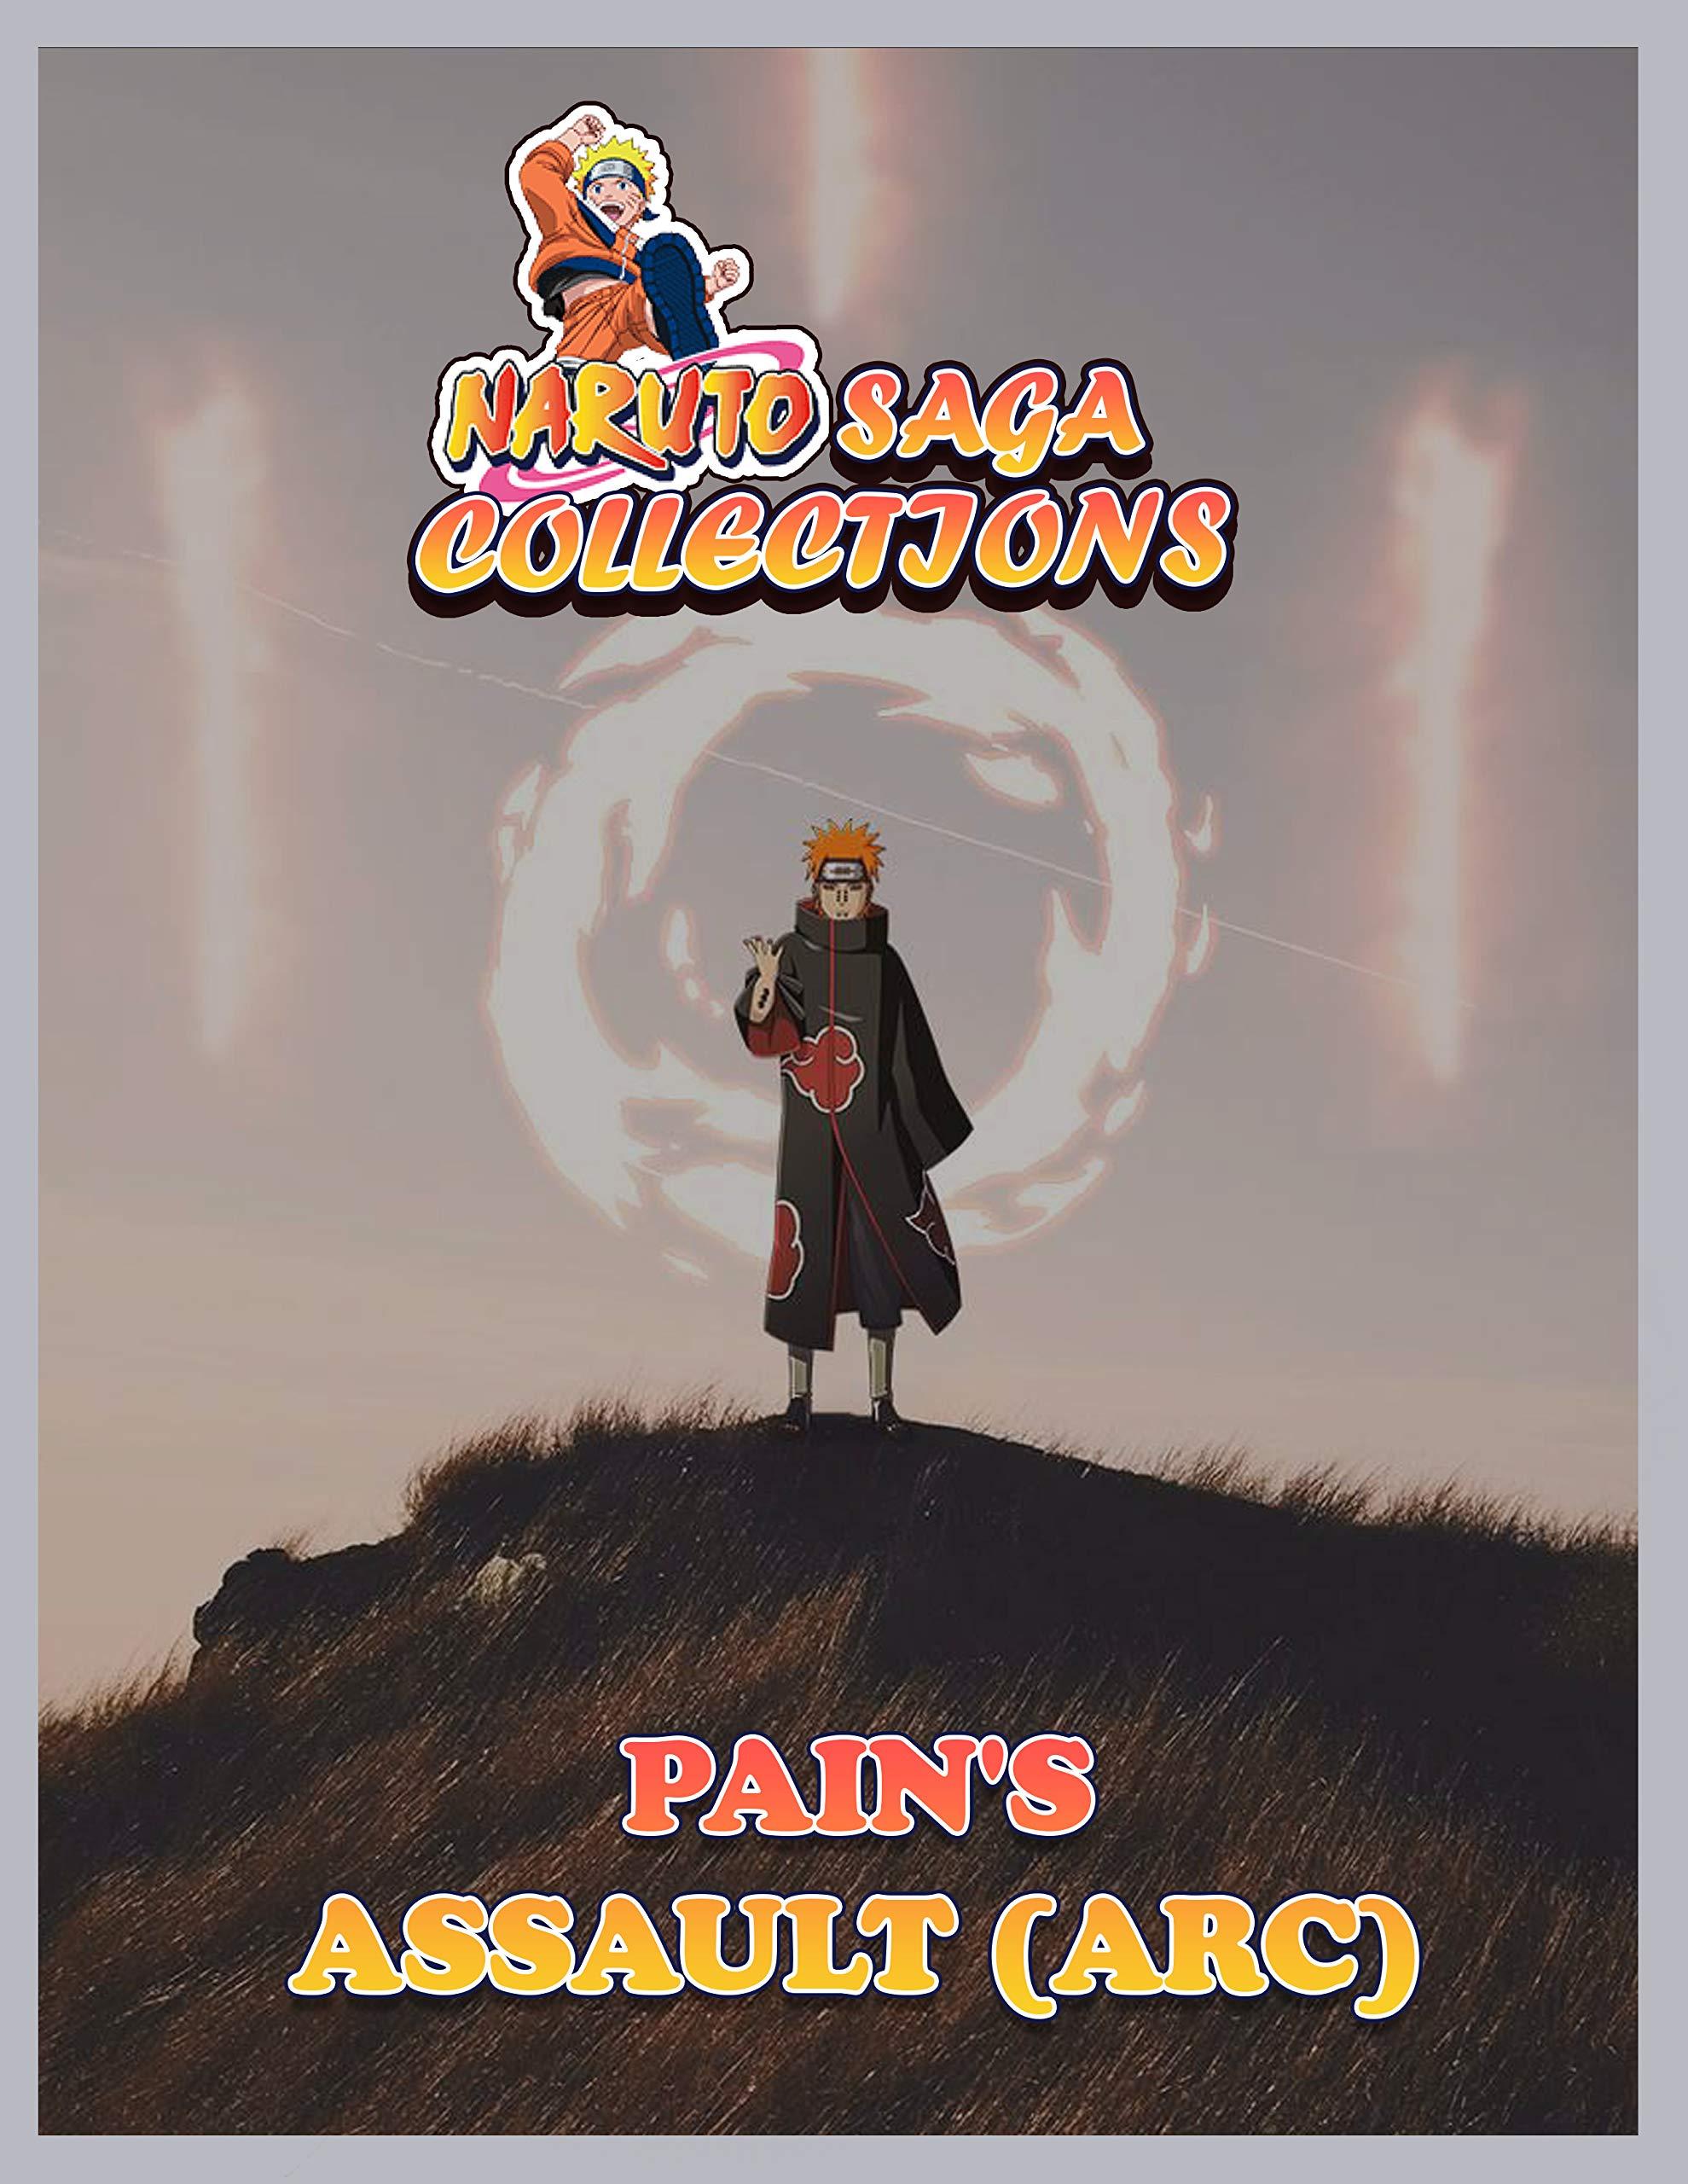 Manga Saga Collections: Naruto Pain's Assault (Arc) Vol 13